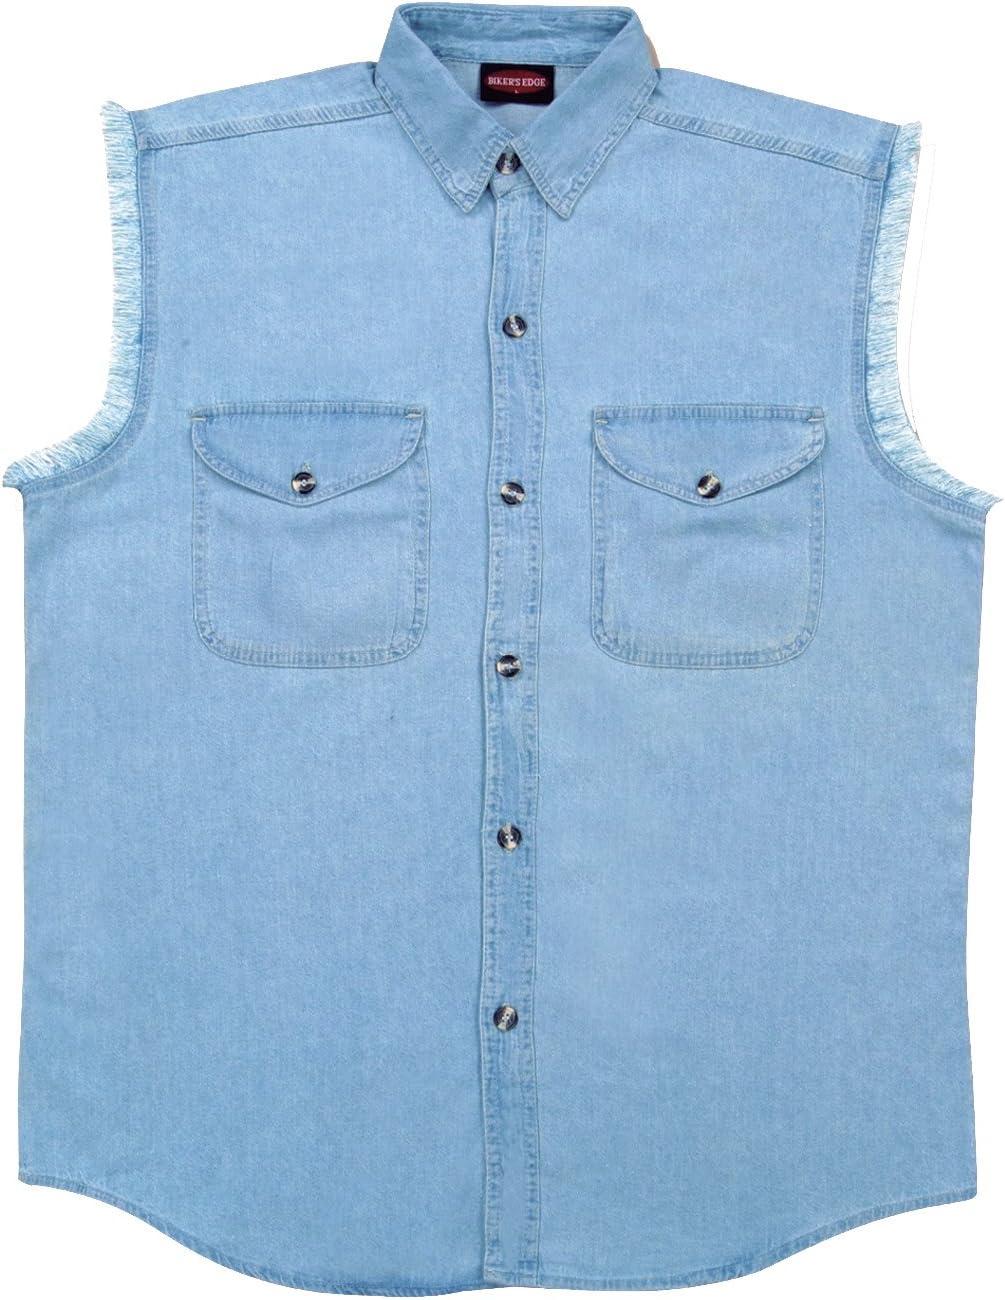 Milwaukee Performance DM1001-LBLU-S Mens Denim Sleeveless Shirt Light Blue Small